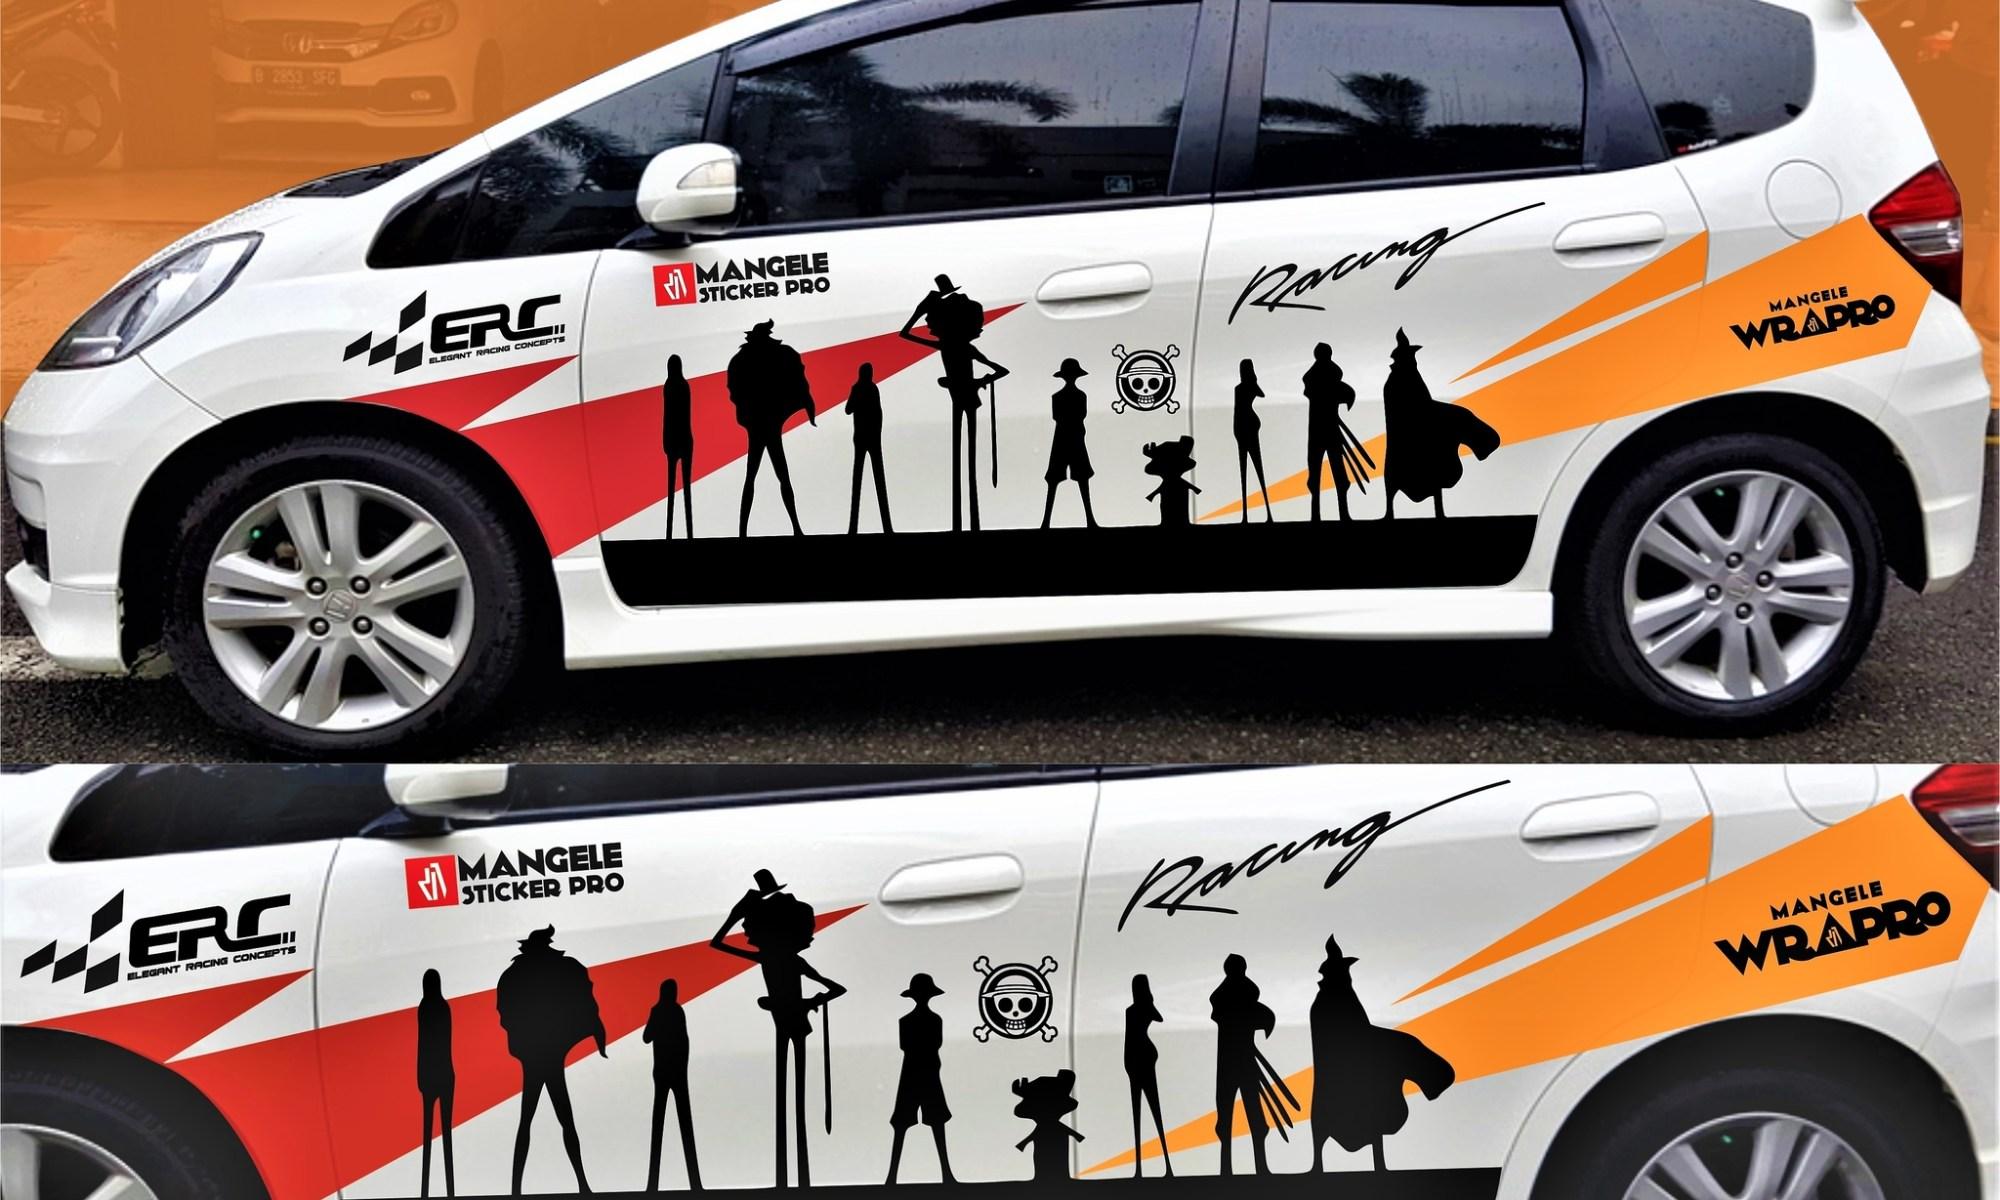 Harga cutting sticker Mobil Bandung, Bengkel polet tempat jasa stiker bandung